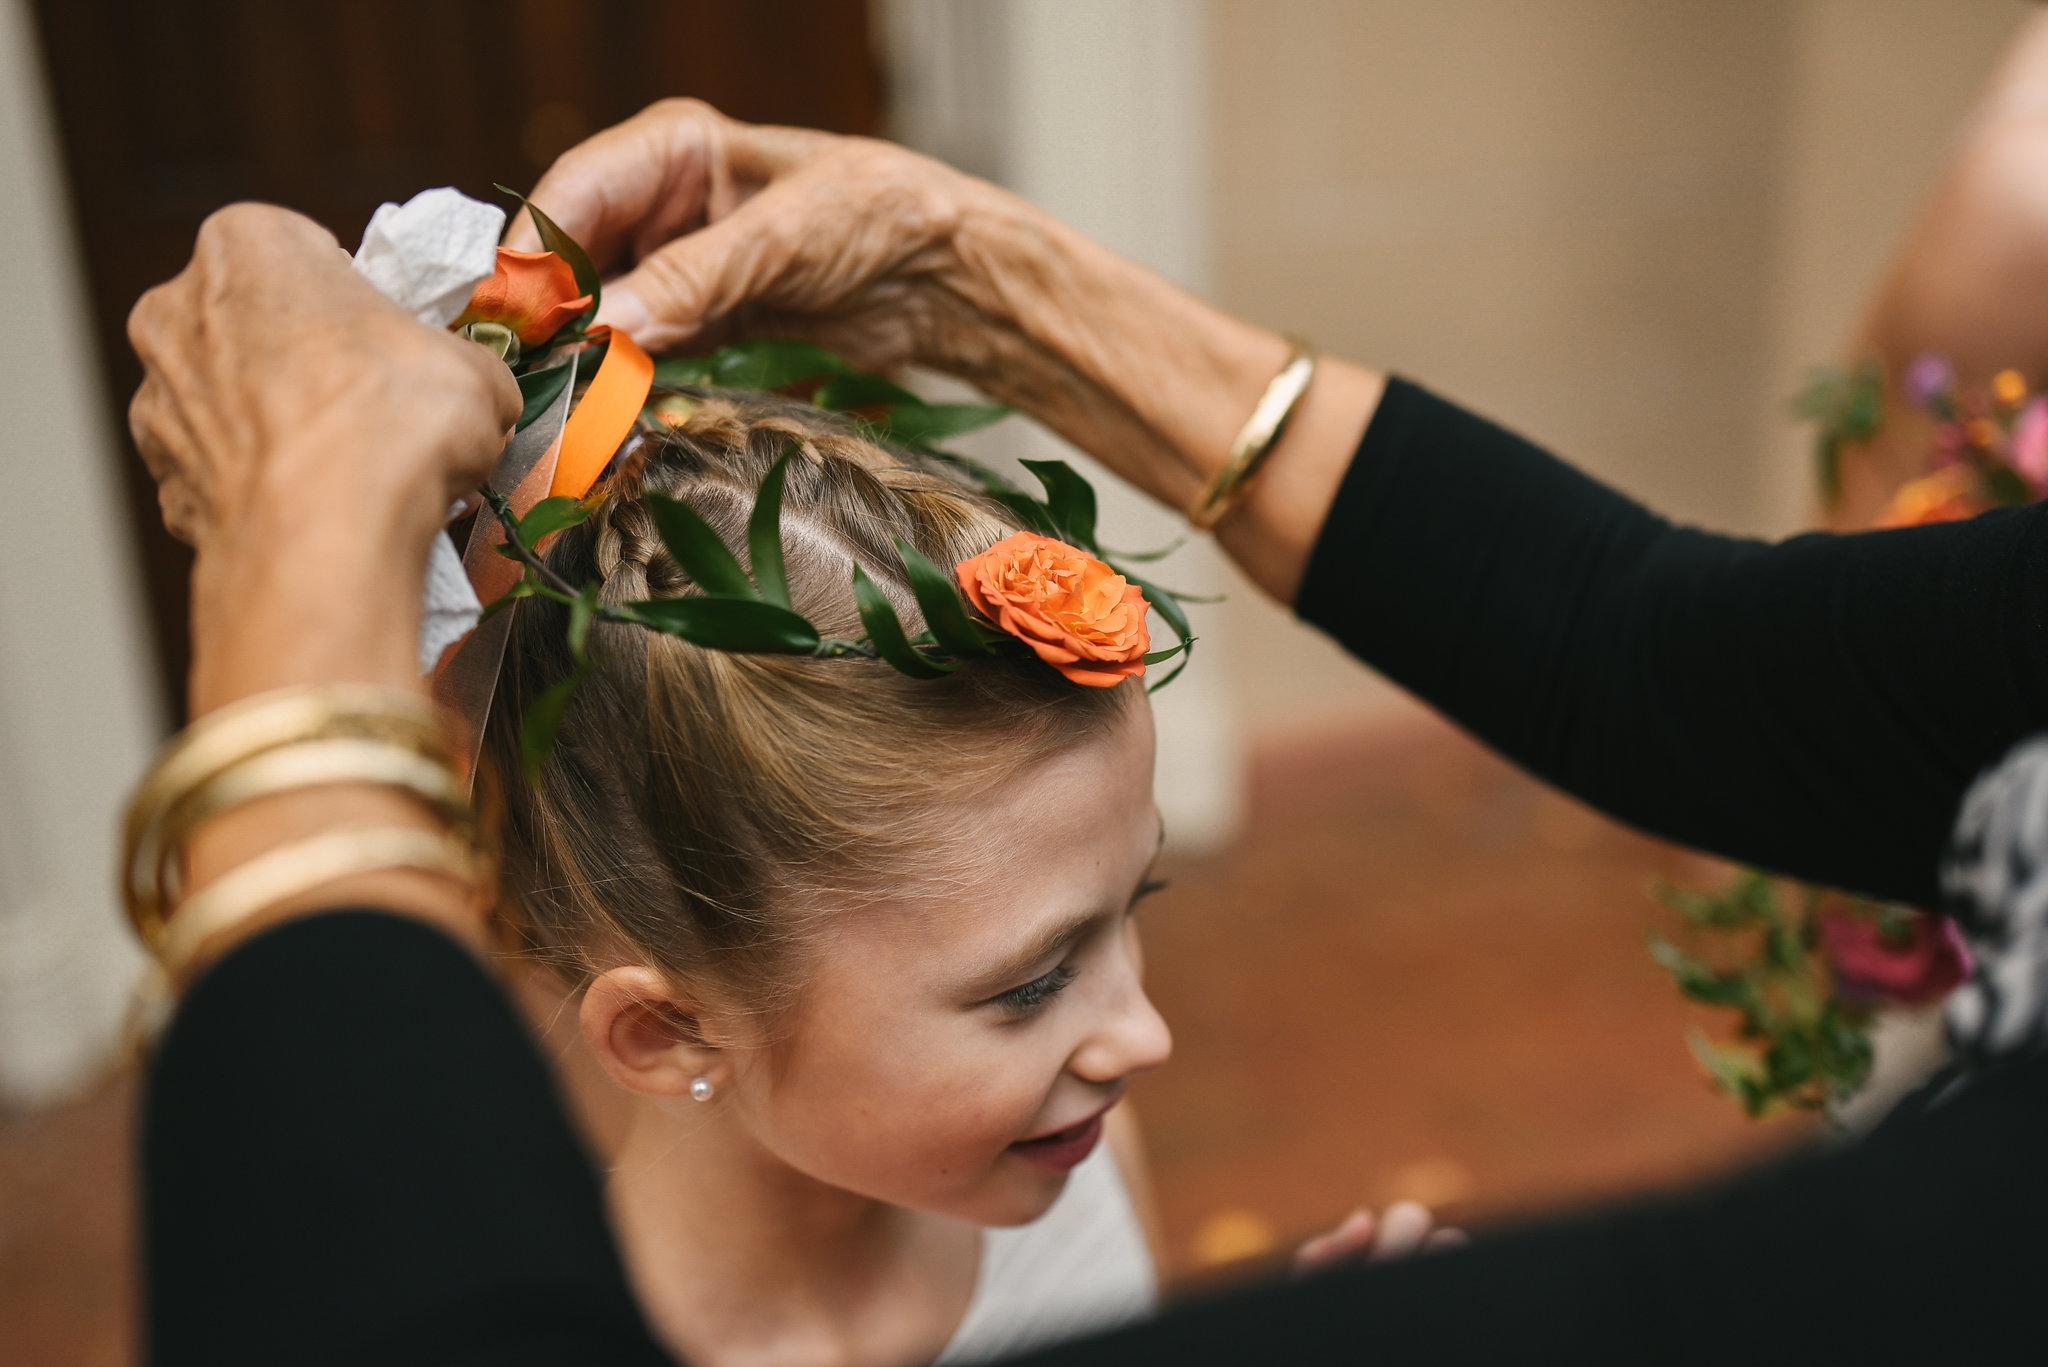 Alexandria, Fall Wedding, Historic, The Enchanted Florist, Wedding Party, Flower Girls, Flower Crown, Getting Ready